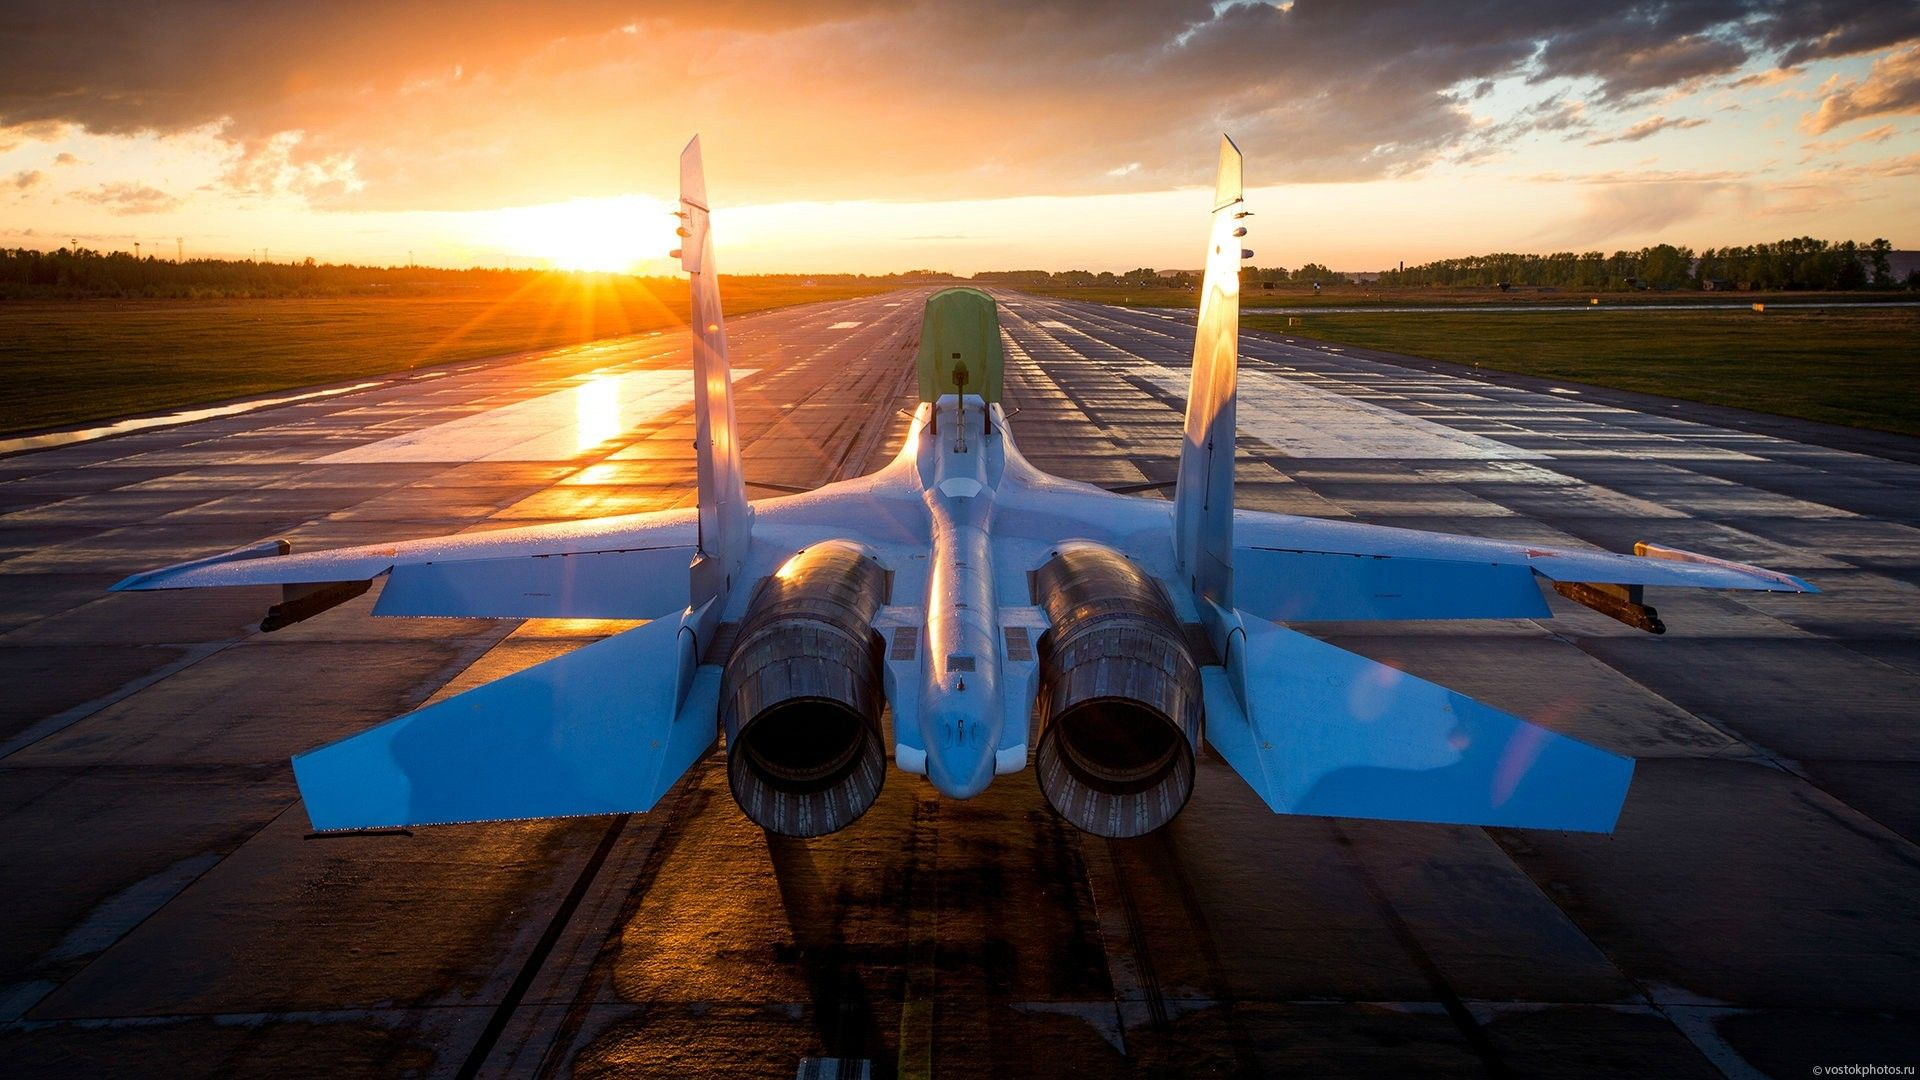 Sukhoi Su30 during sunset. [1920x1080] Need iPhone 6S